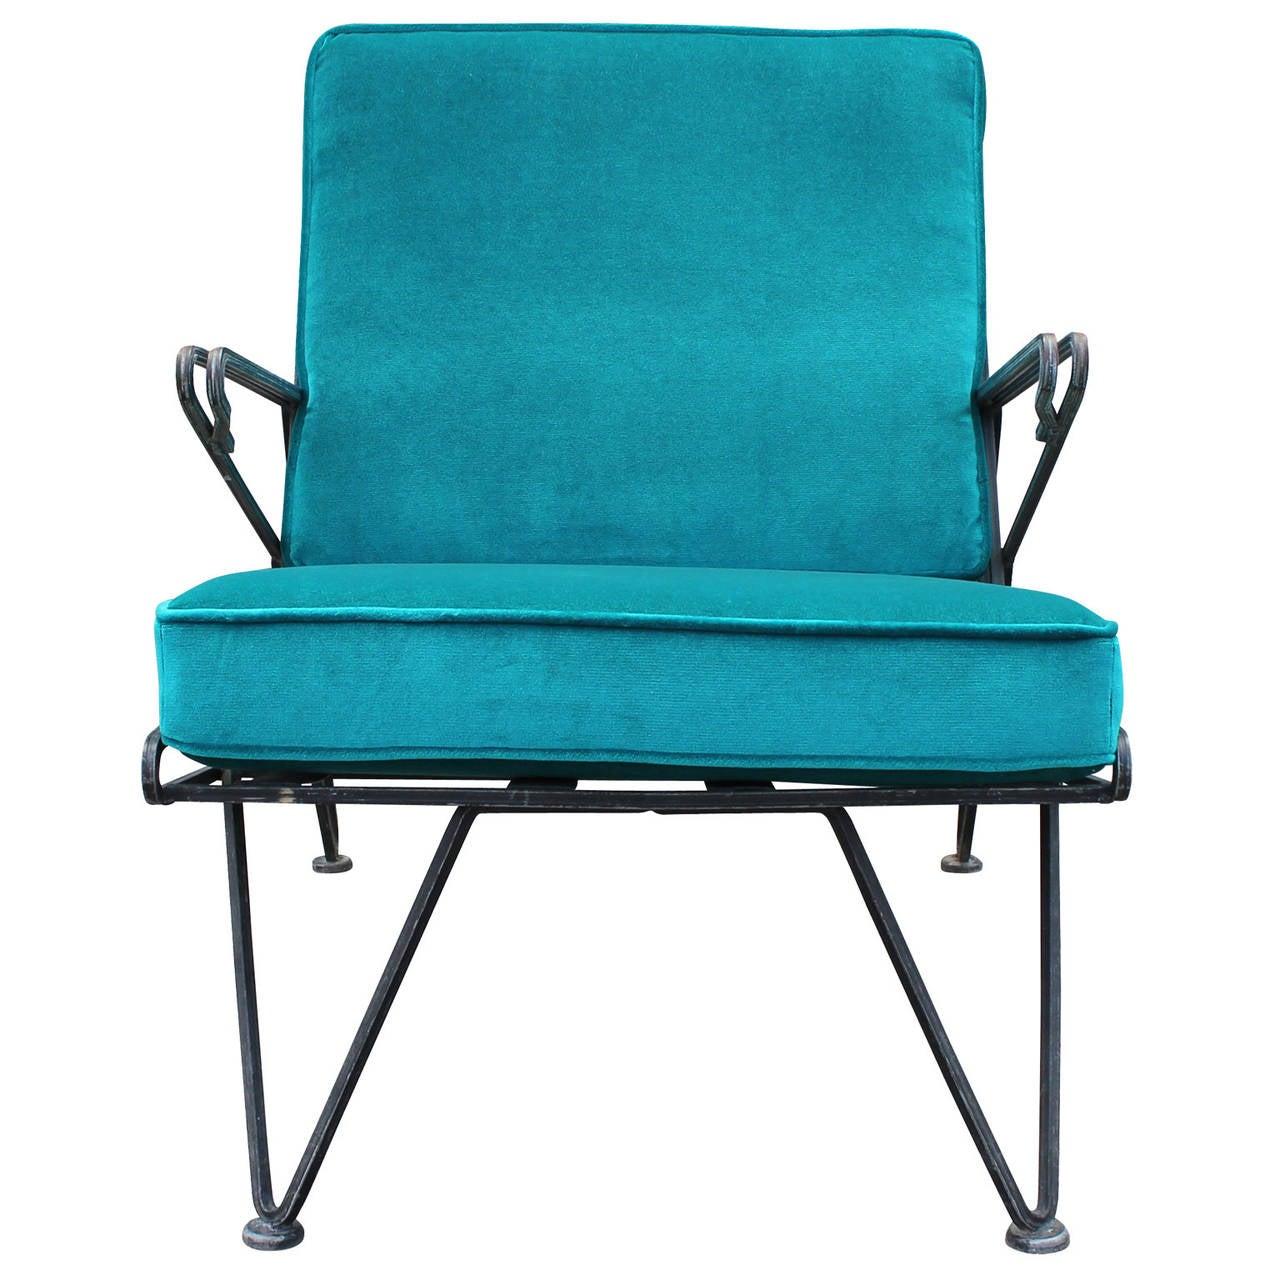 Phenomenal Pair of Teal Velvet Italian Style Mid Century Modern Lounge Chairs